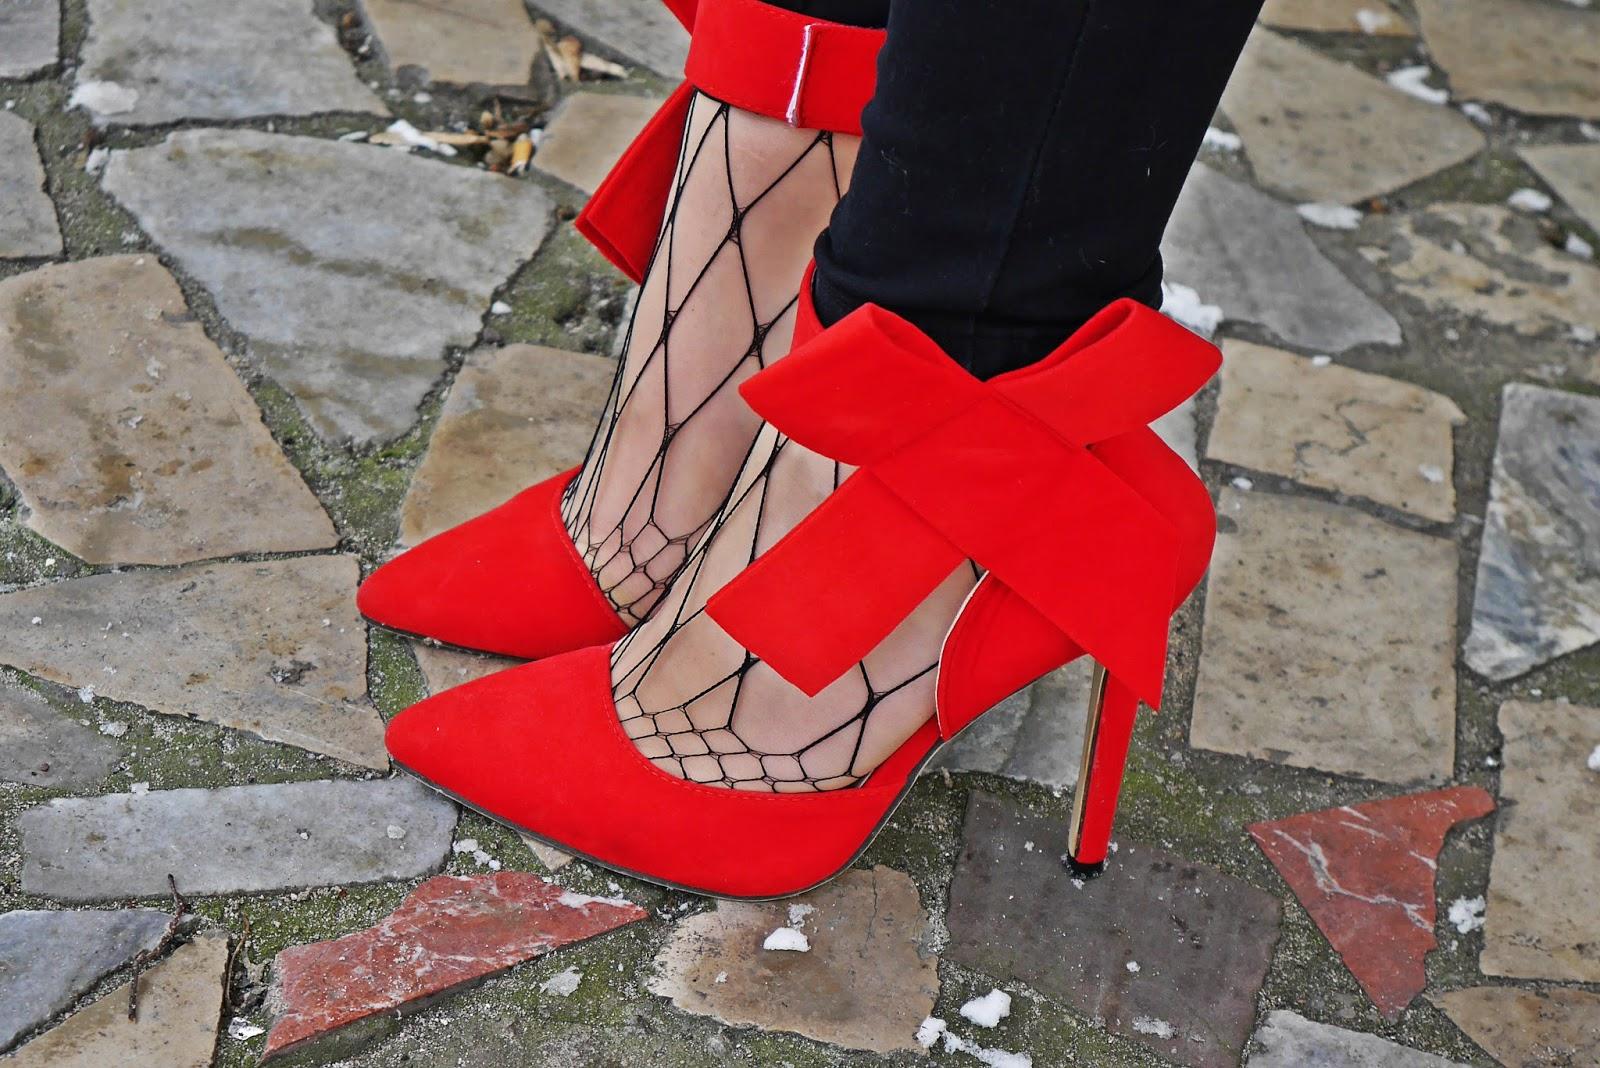 5_red_shirt_fur_waist_red_heels_karyn_blog_modowy_120218a